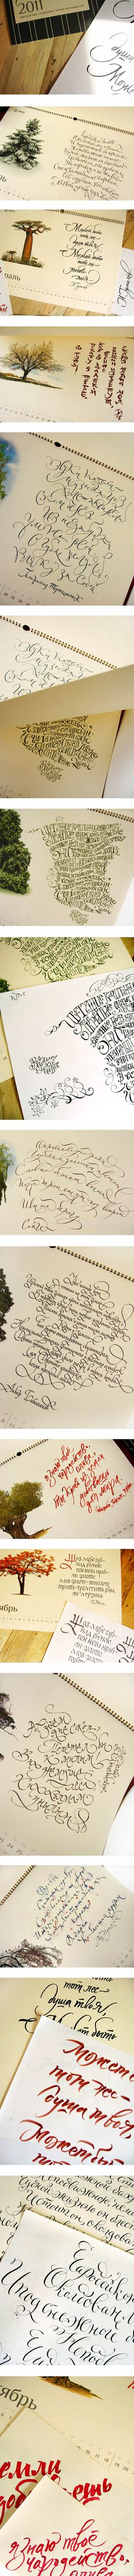 Calligraphy for the calendar. by Marina Marjina, via Behance